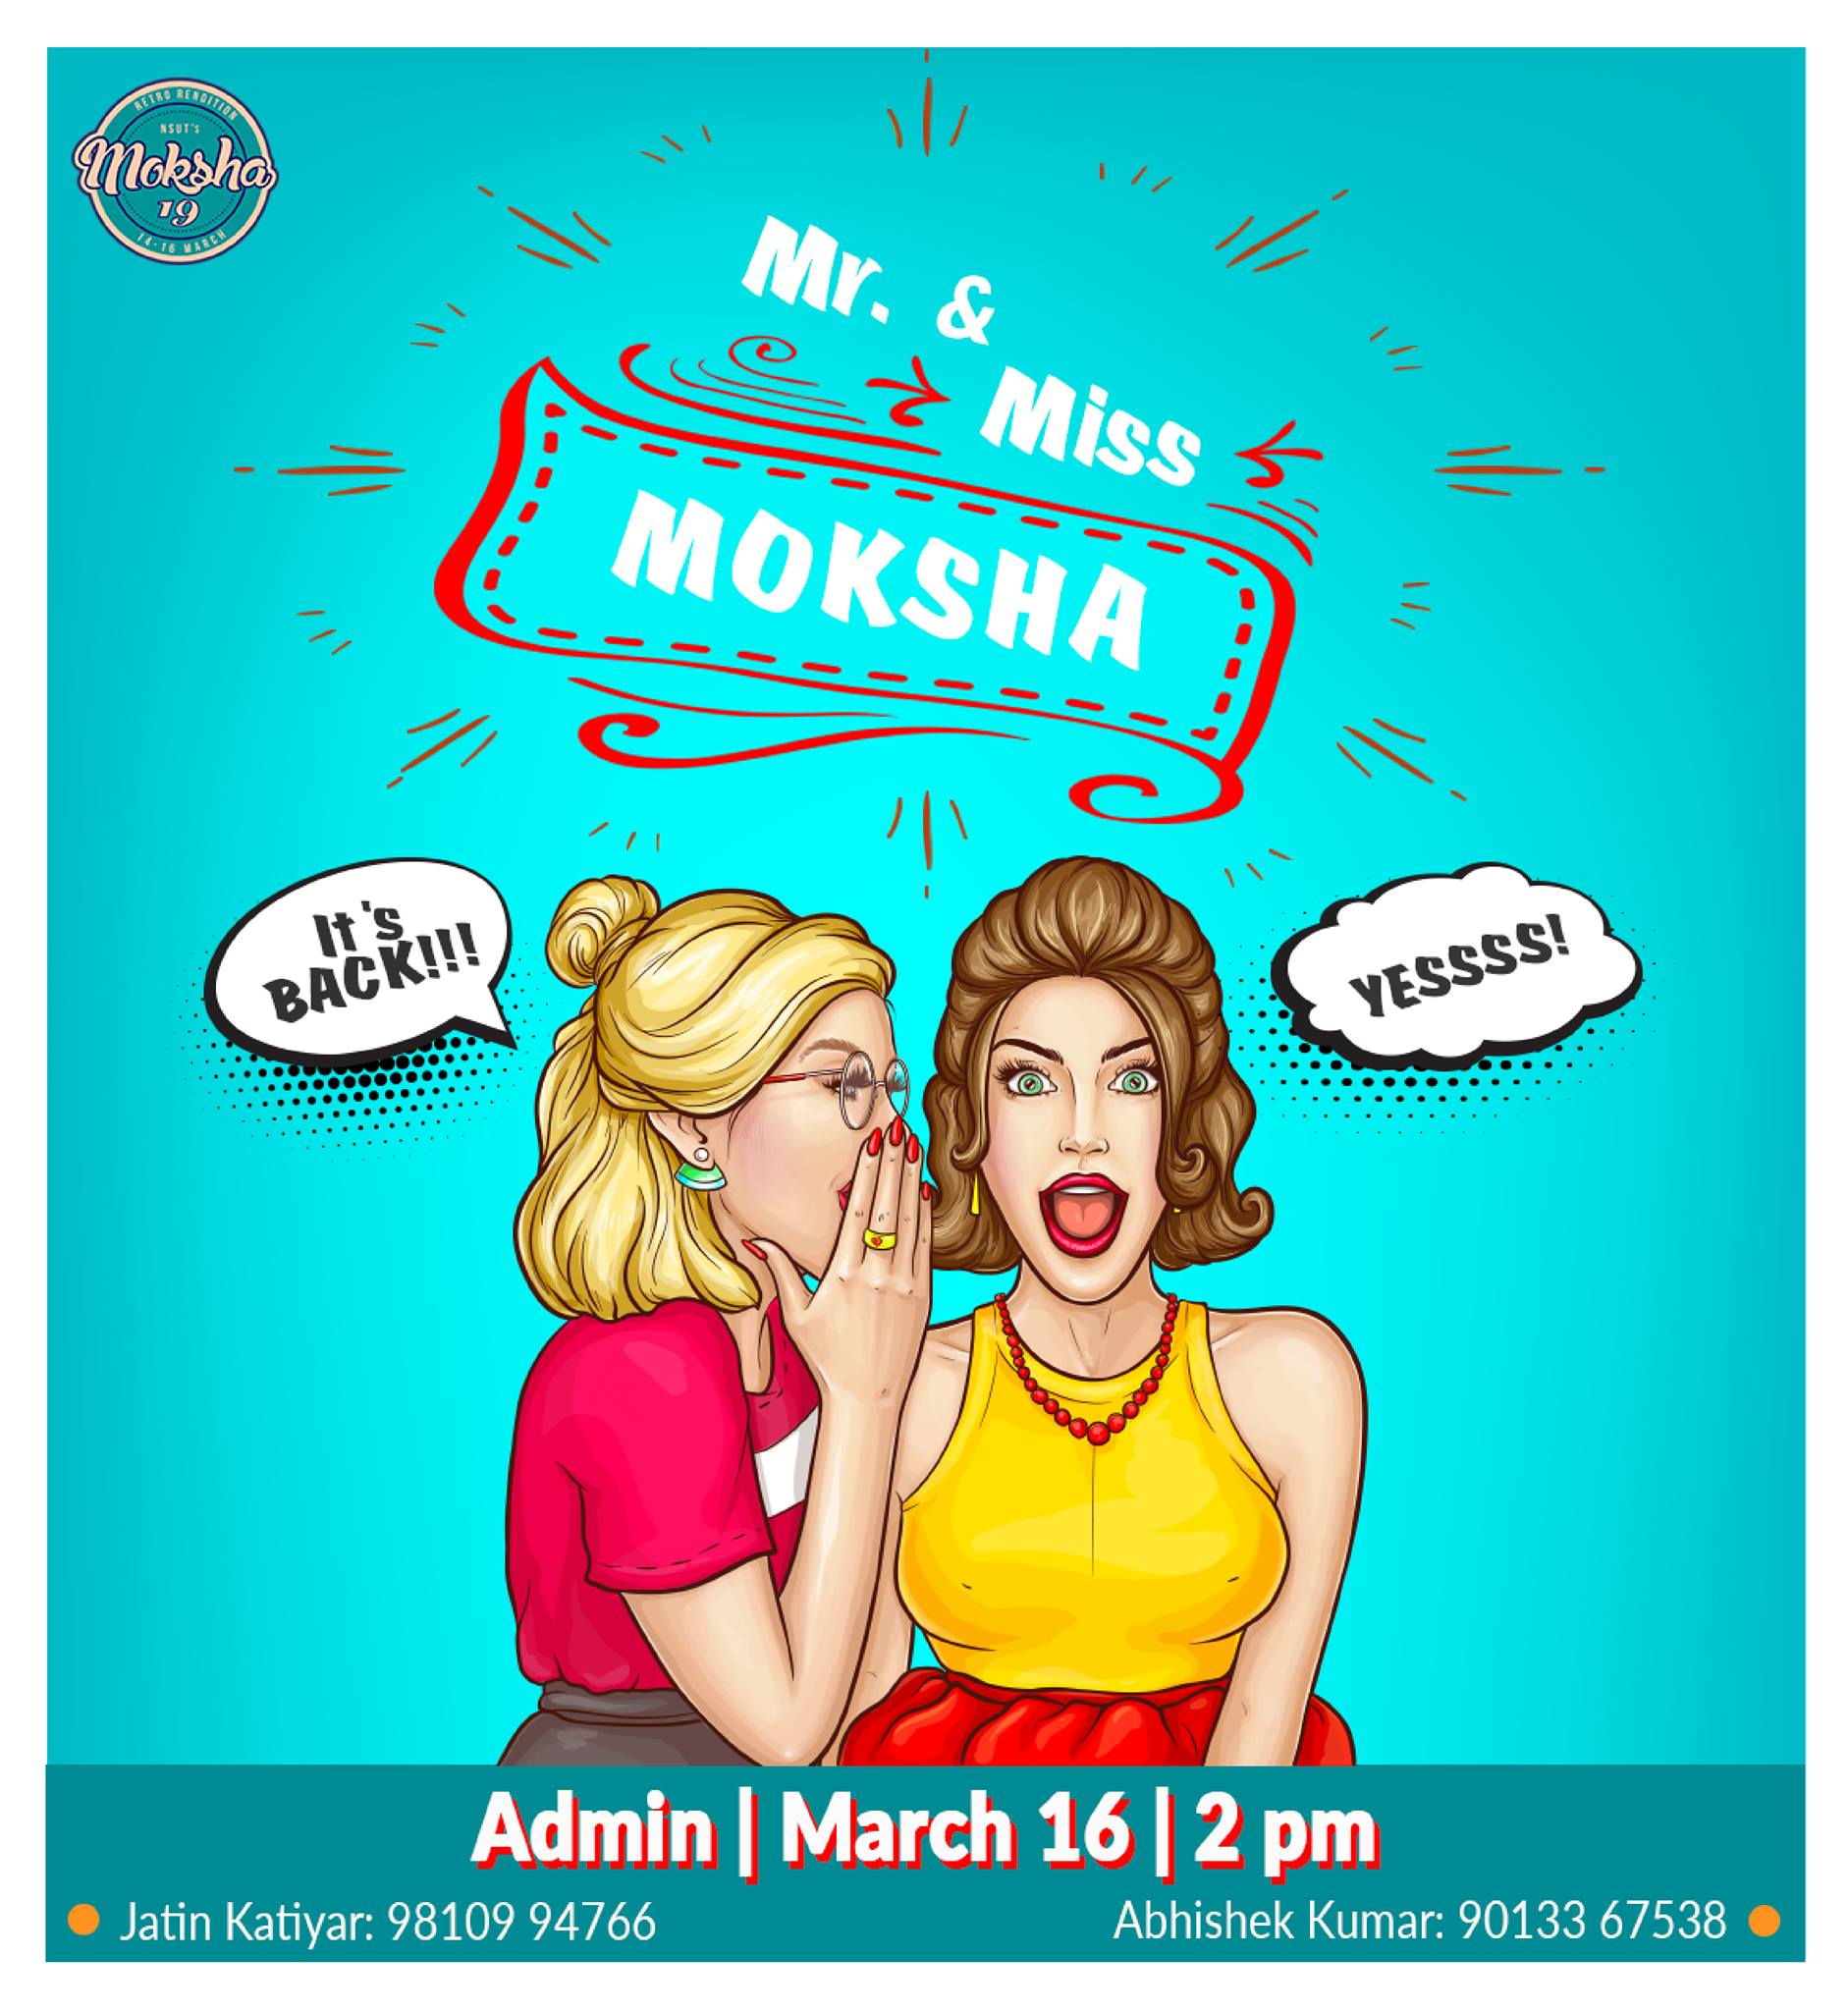 Mr and Miss Moksha